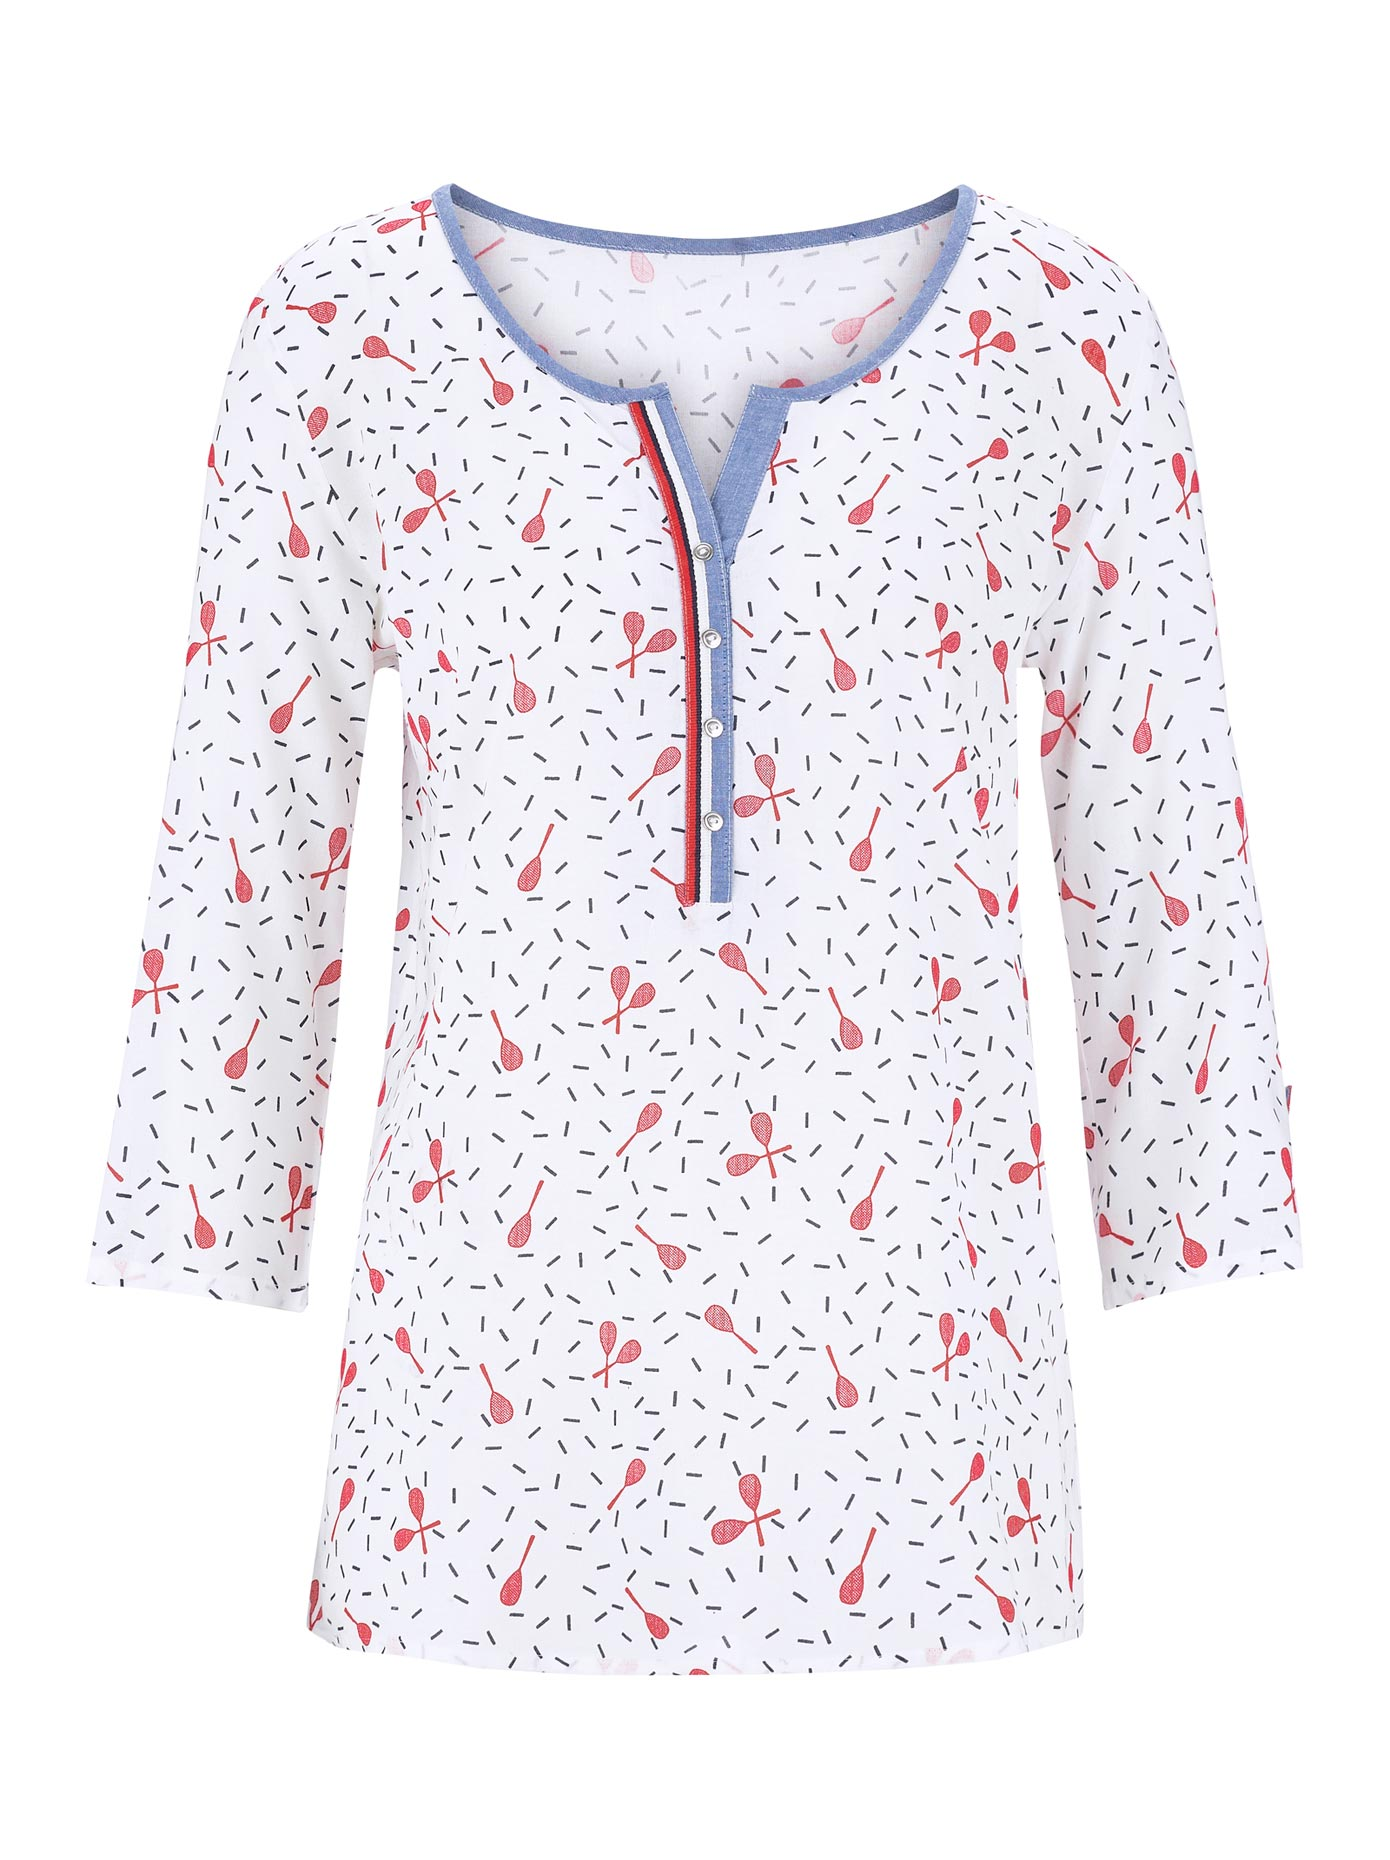 Casual Looks Bluse mit peppigem Tennisschläger-Dessin